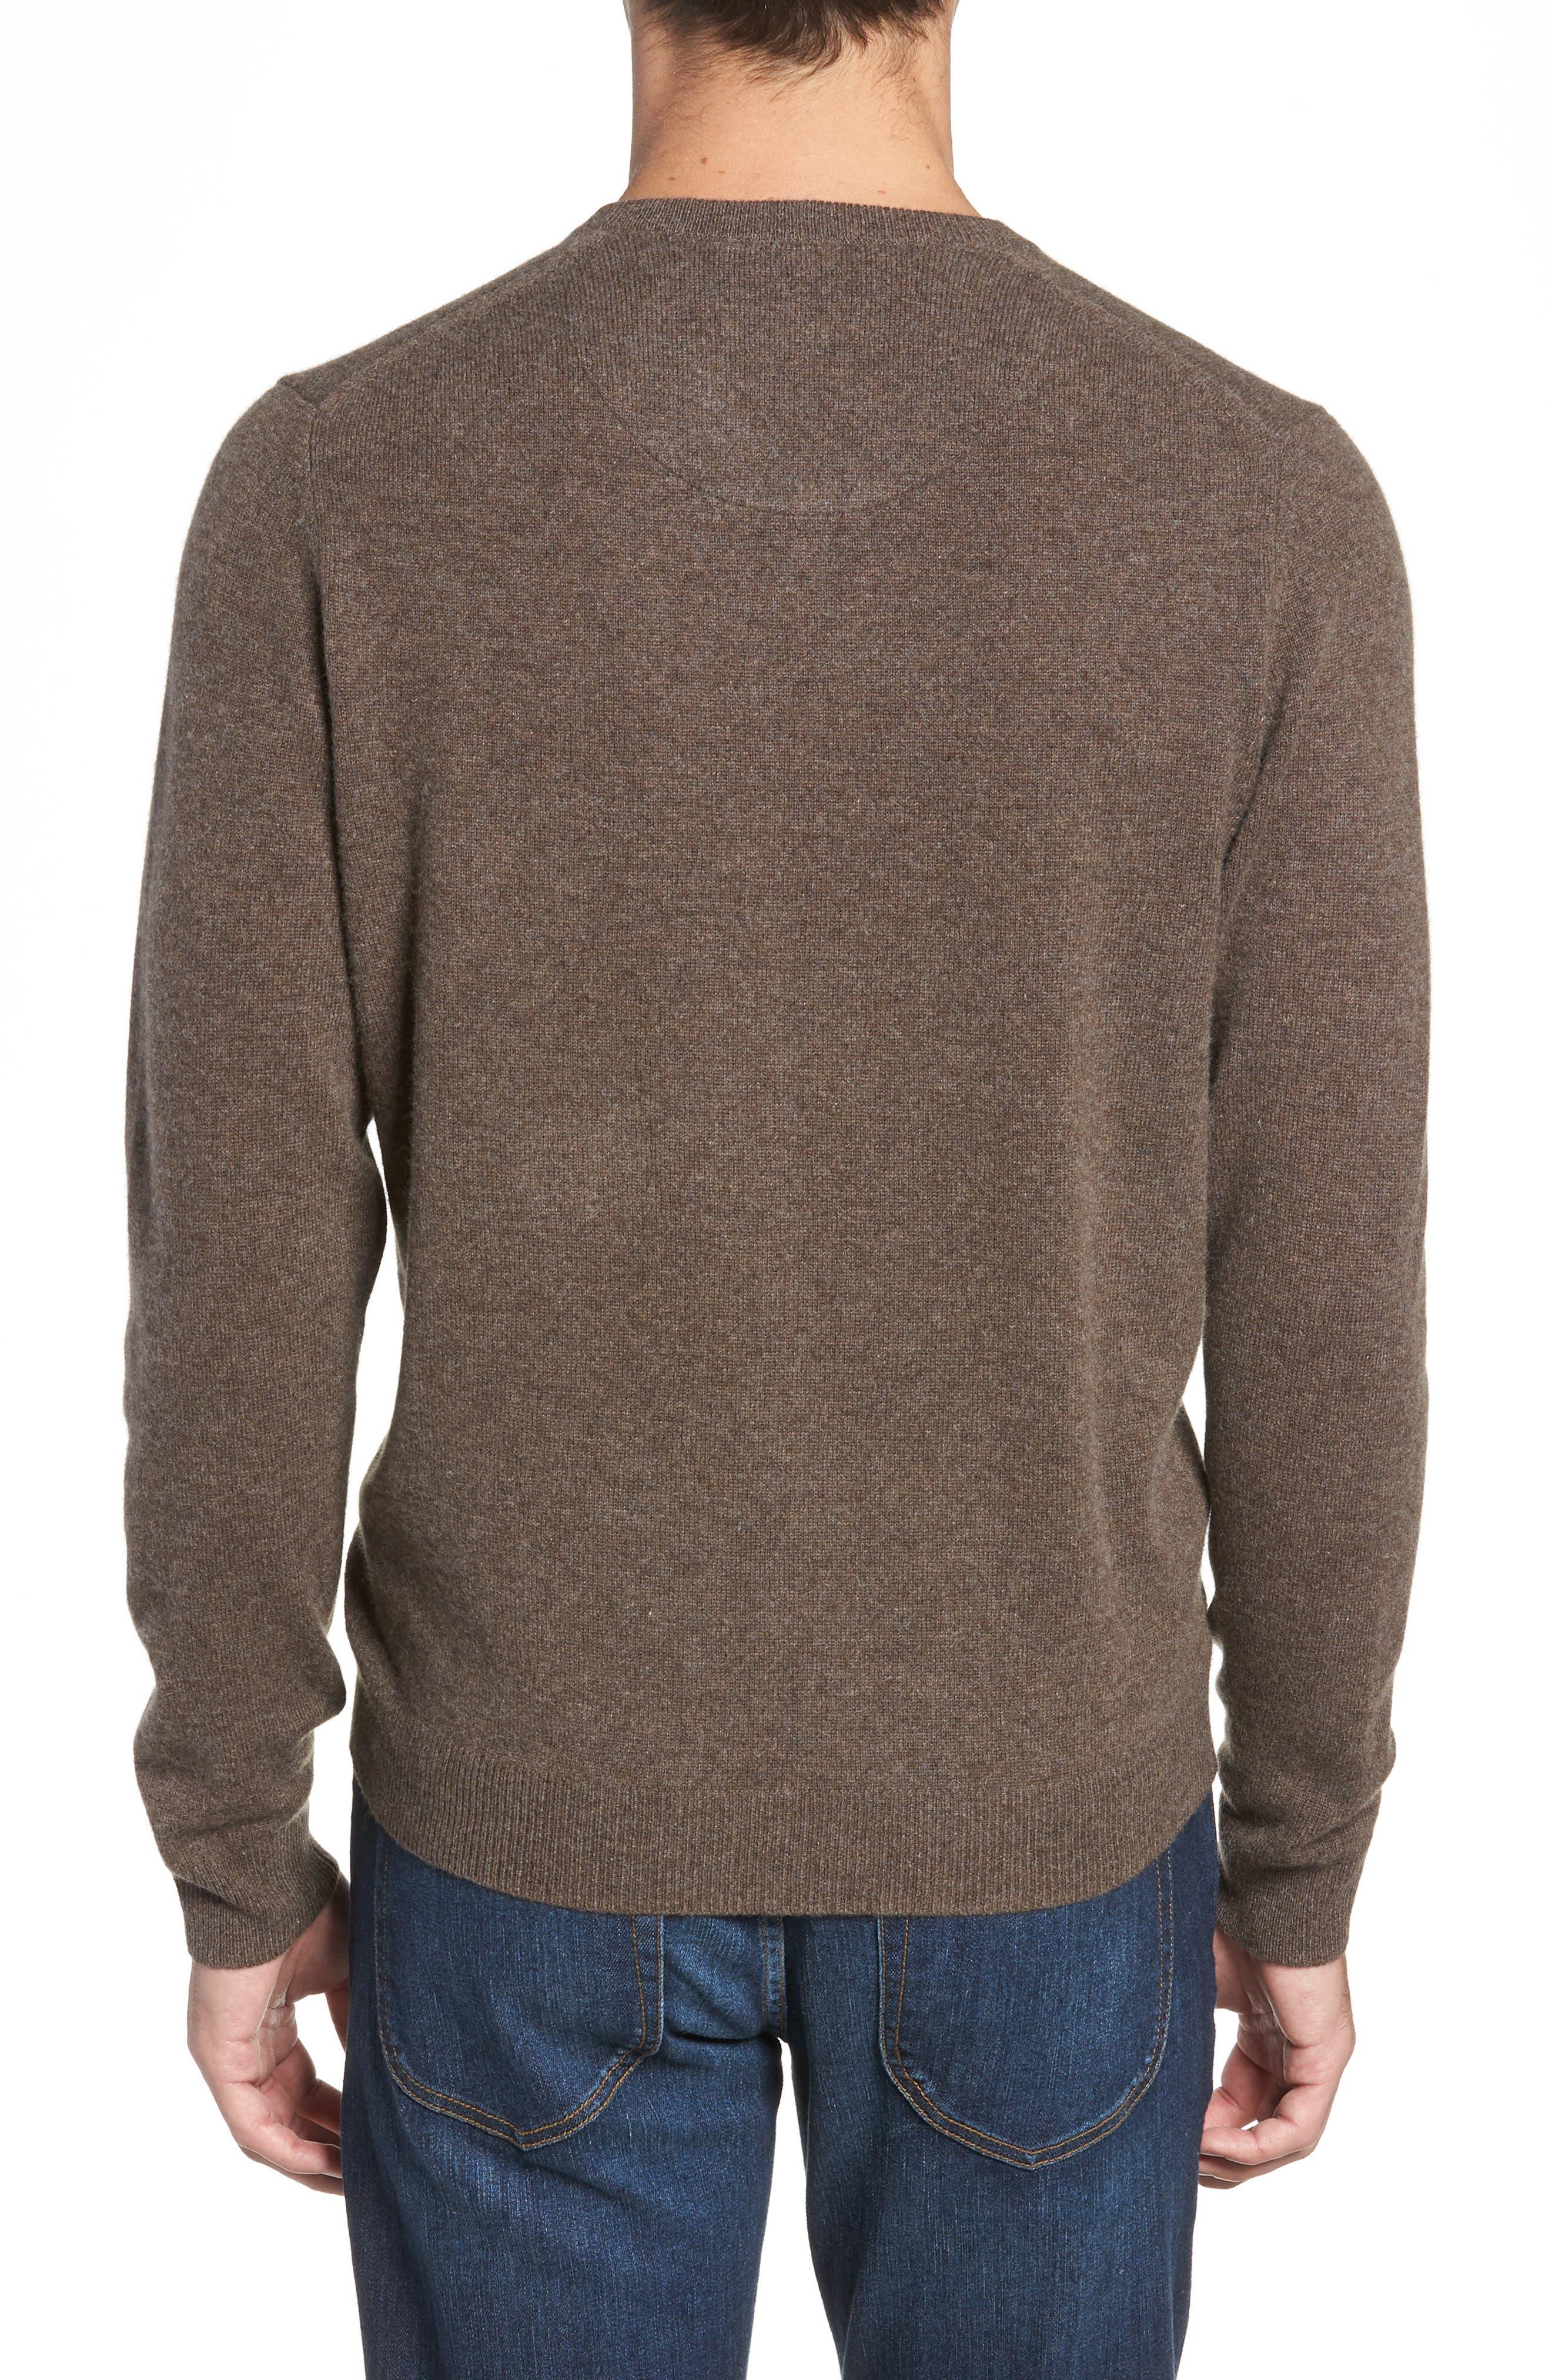 Cashmere V-Neck Sweater,                             Alternate thumbnail 2, color,                             210